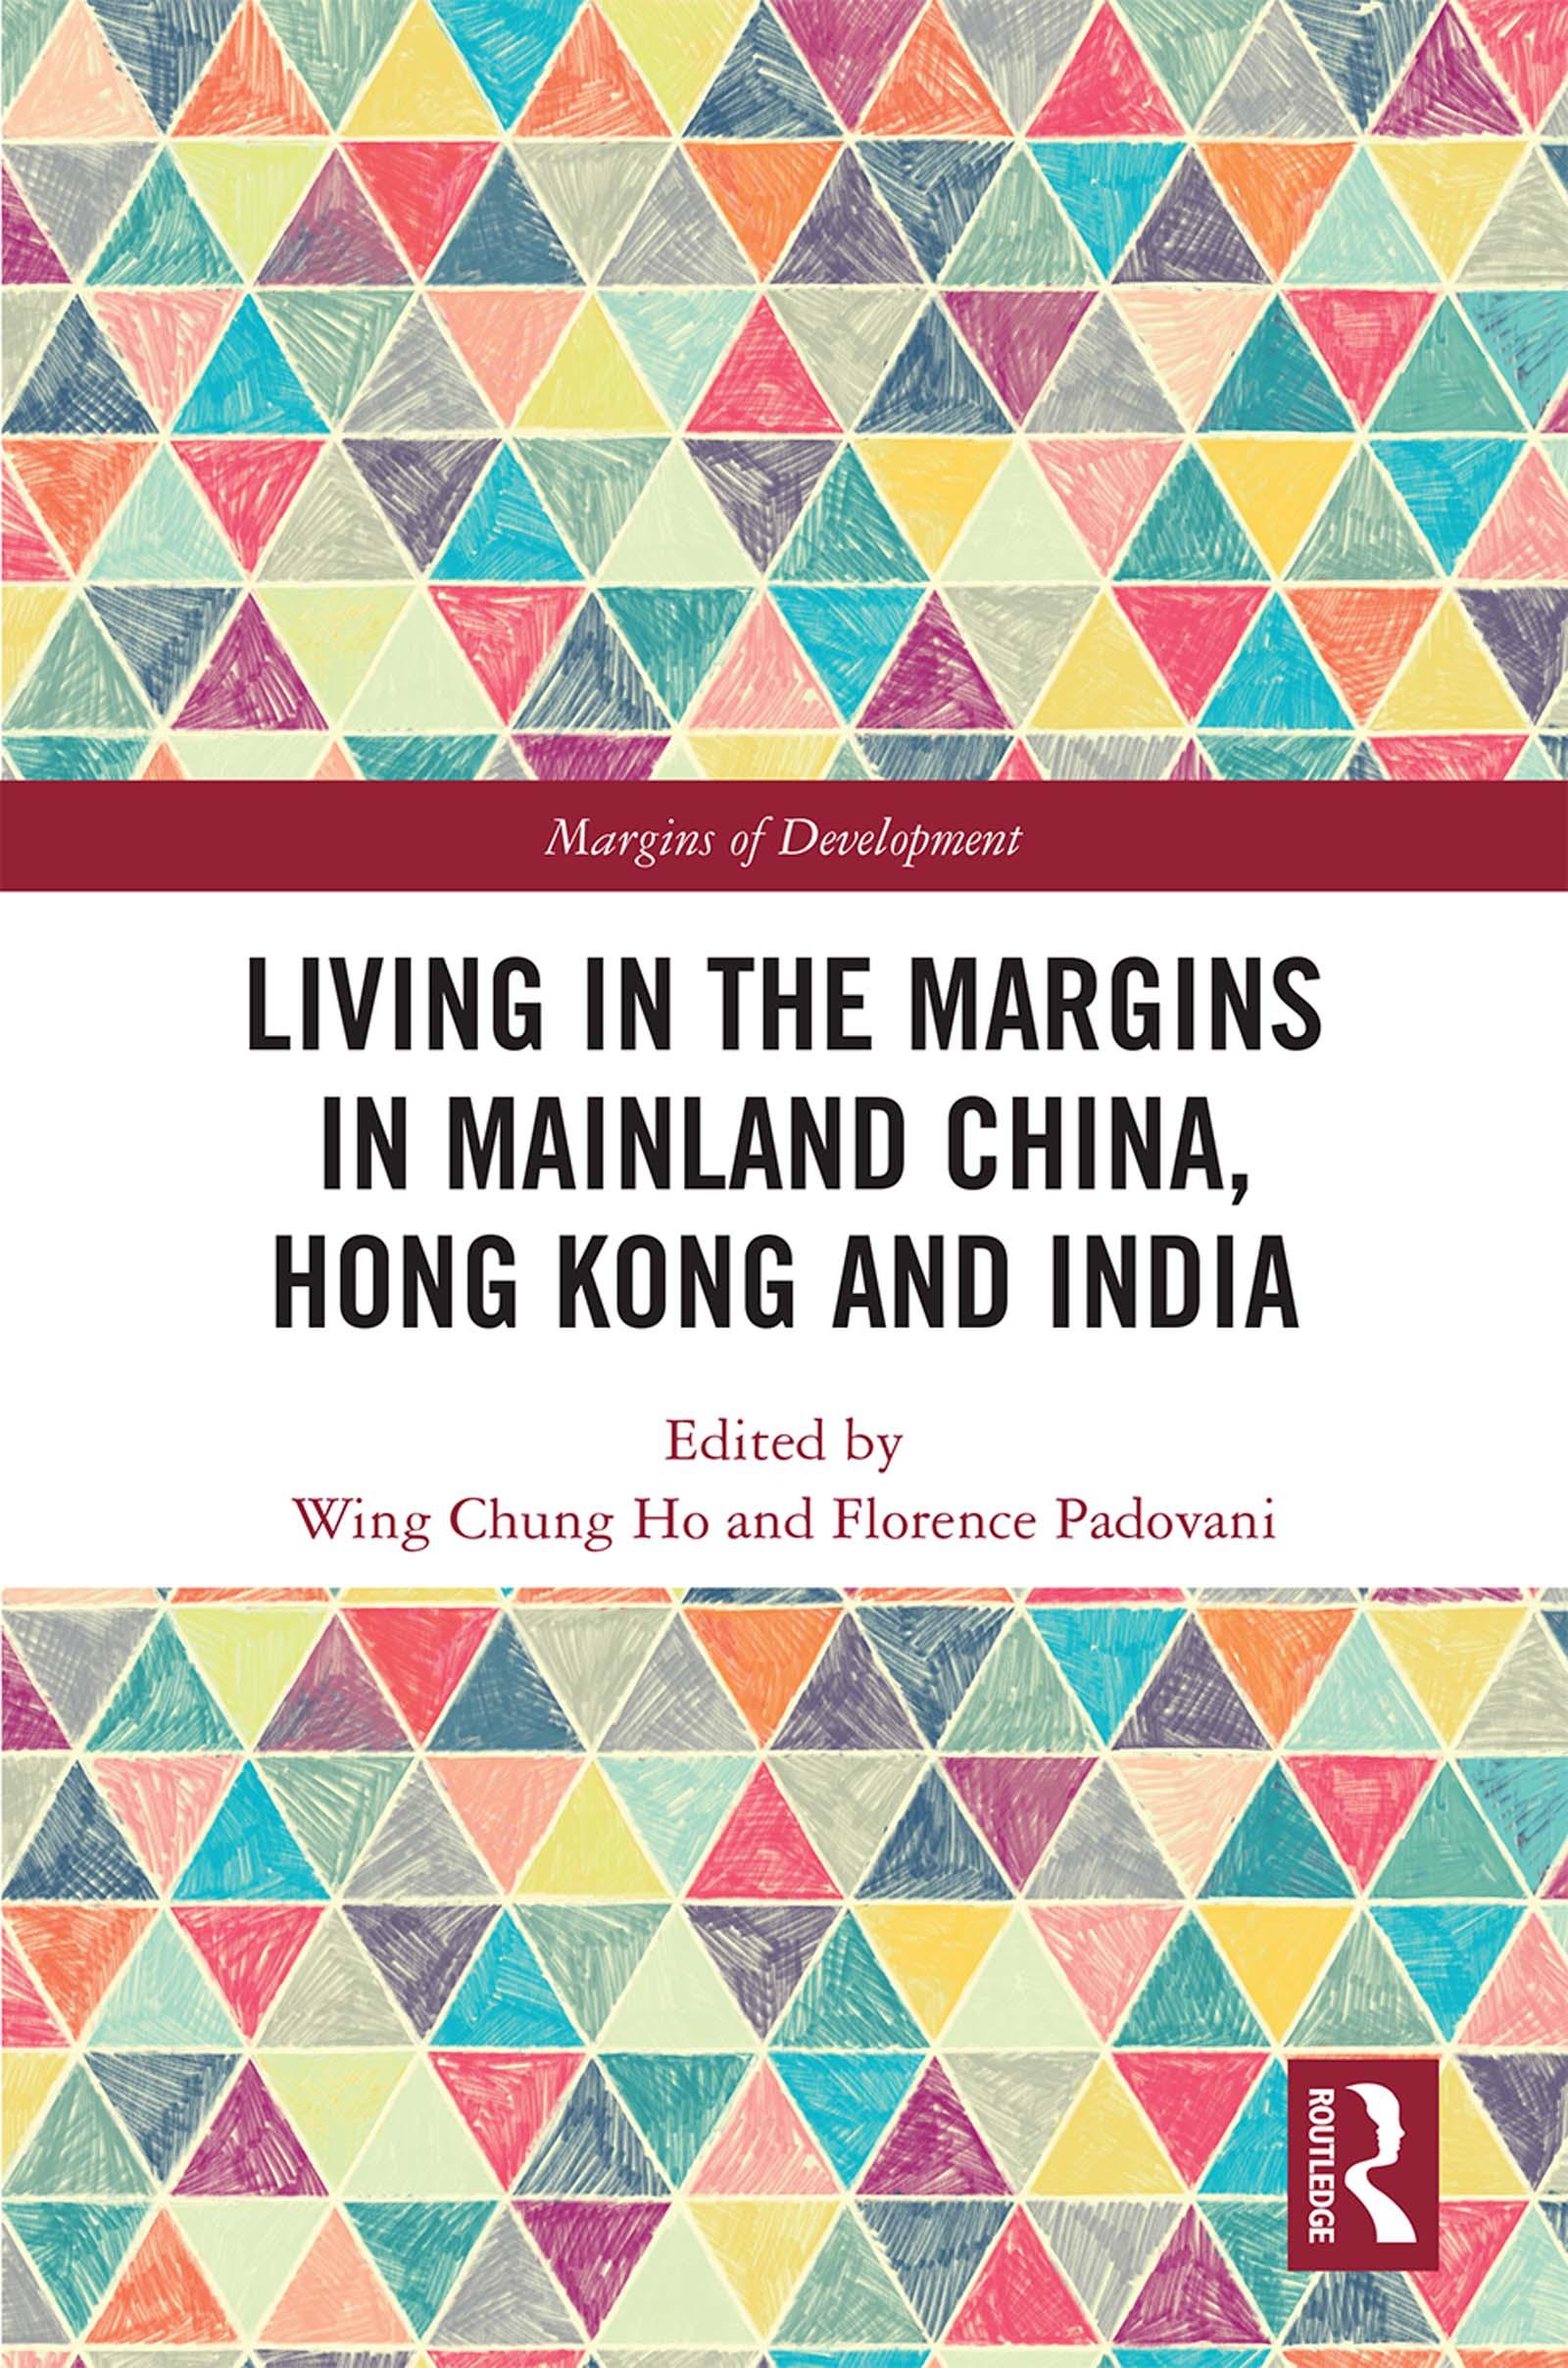 Living in the Margins in Mainland China, Hong Kong and India